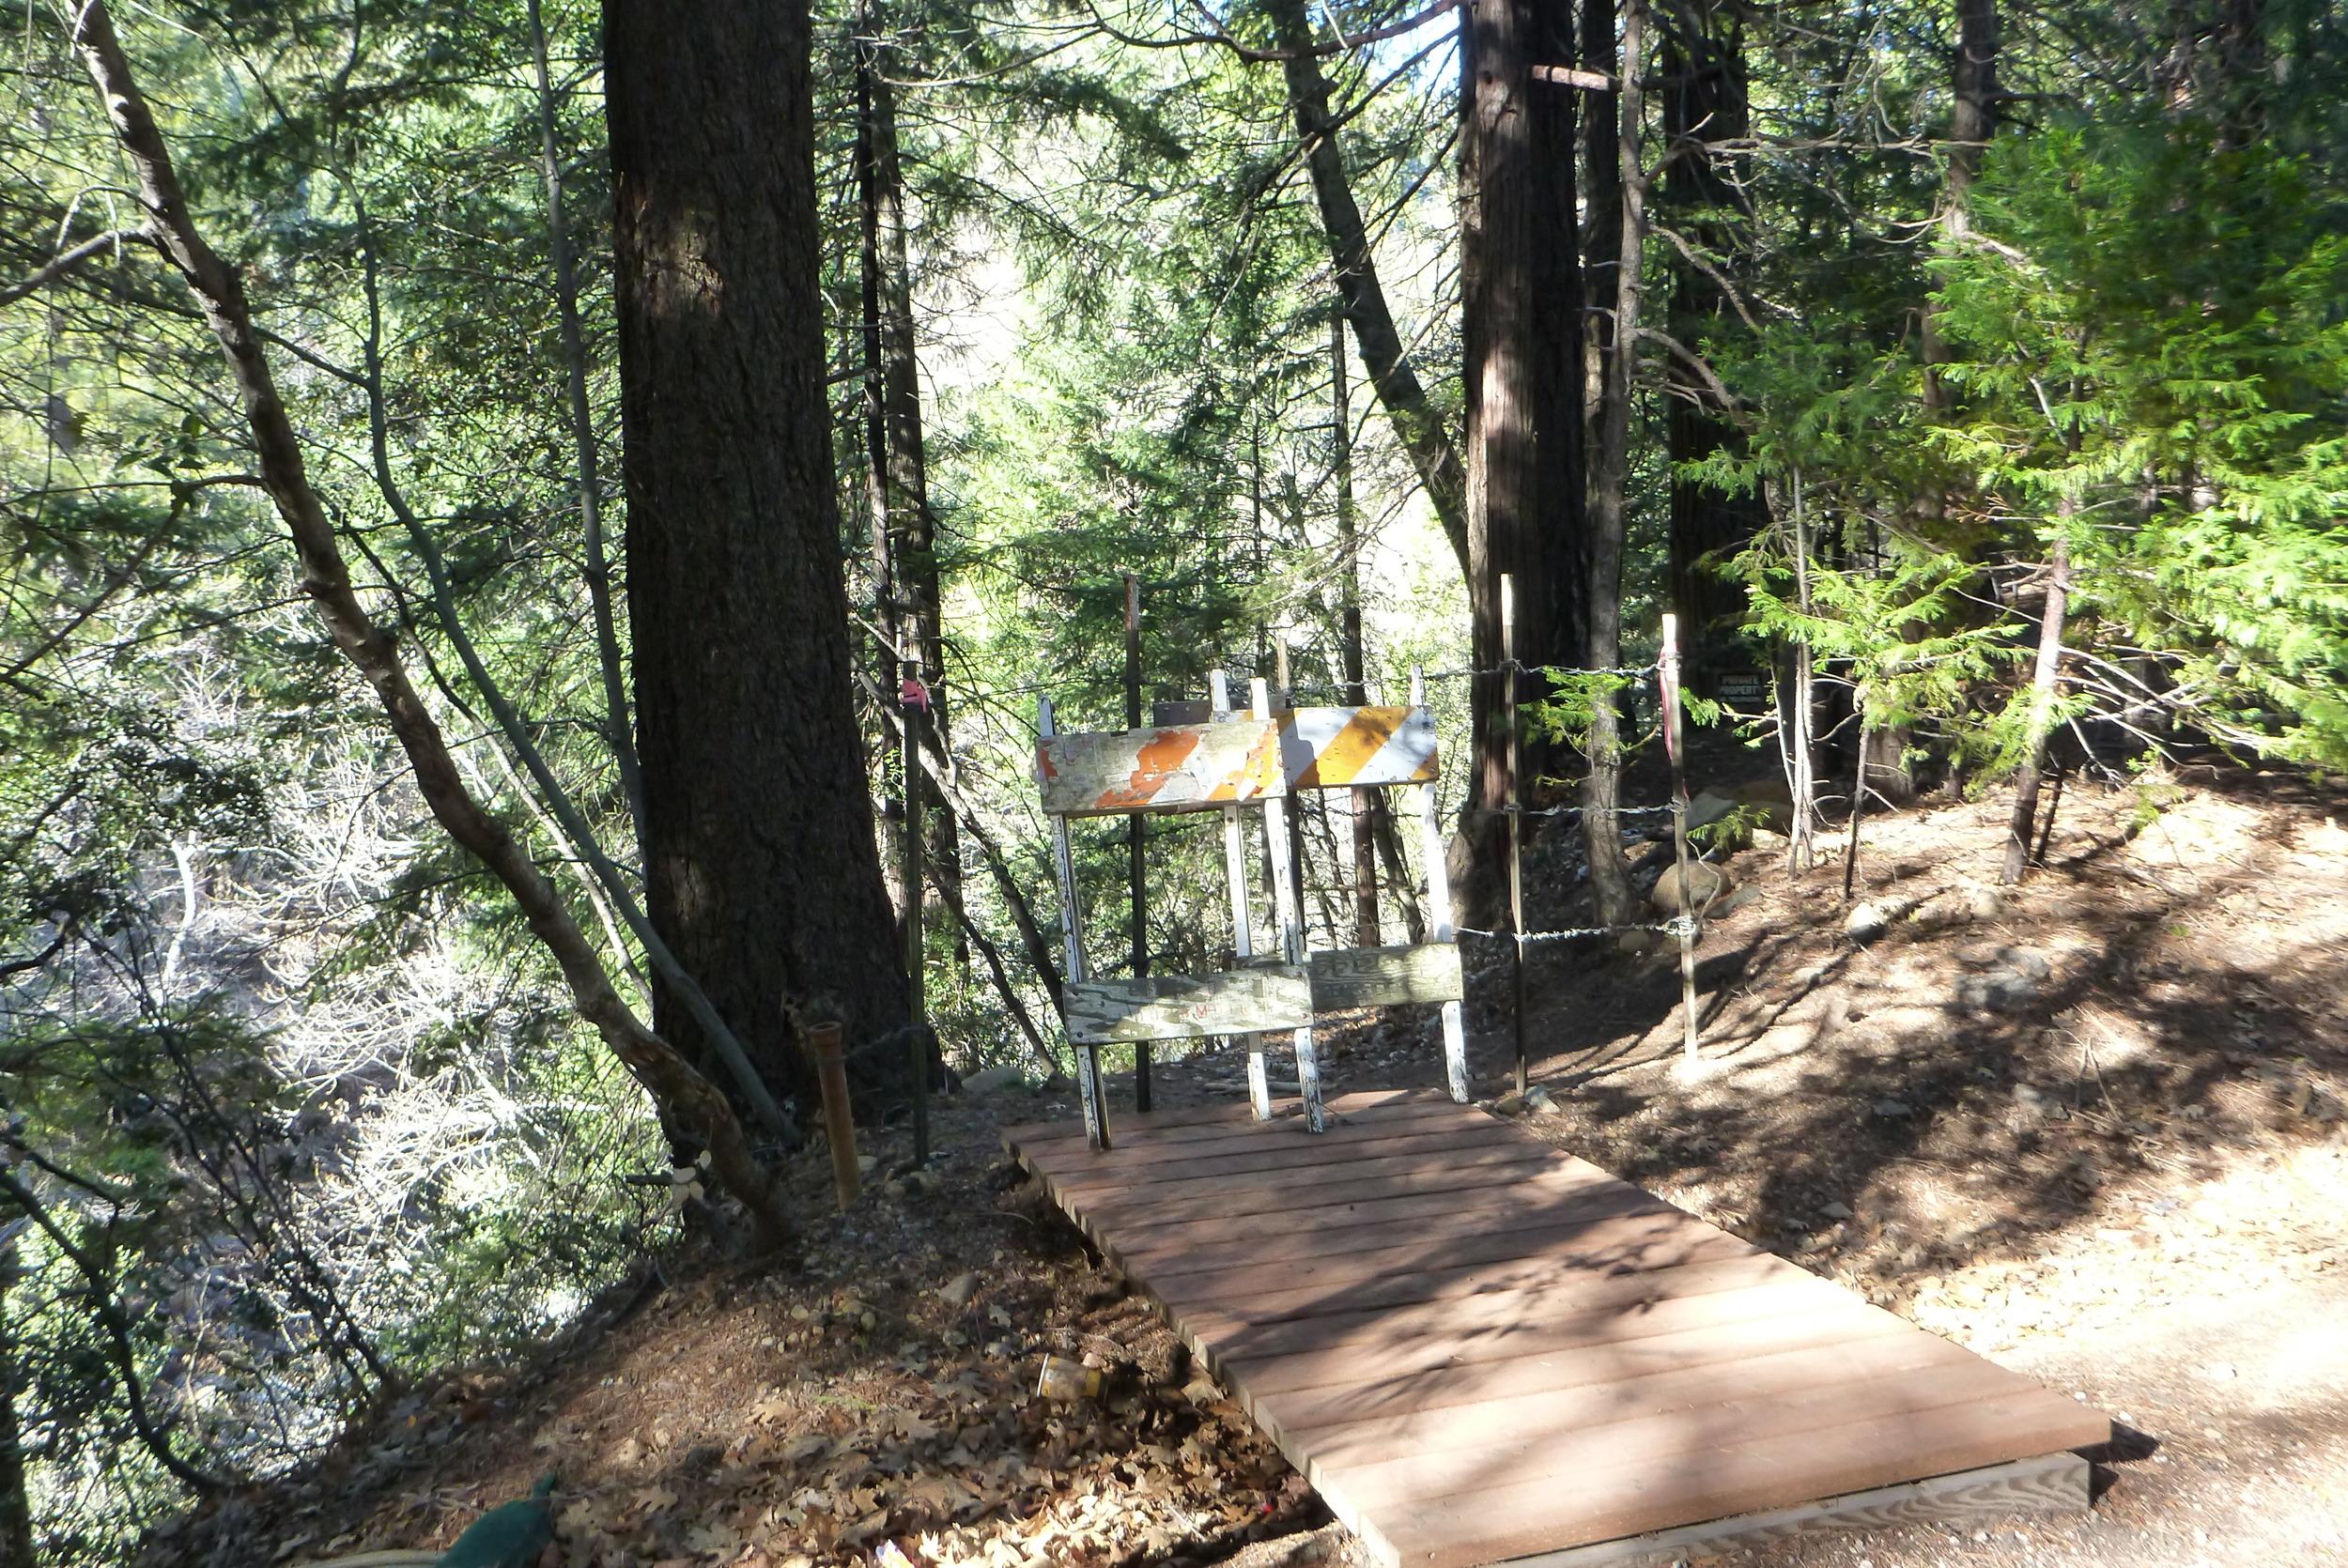 Trail Closure between Tauhindauli Park and Dunsmuir Botanical Gardens